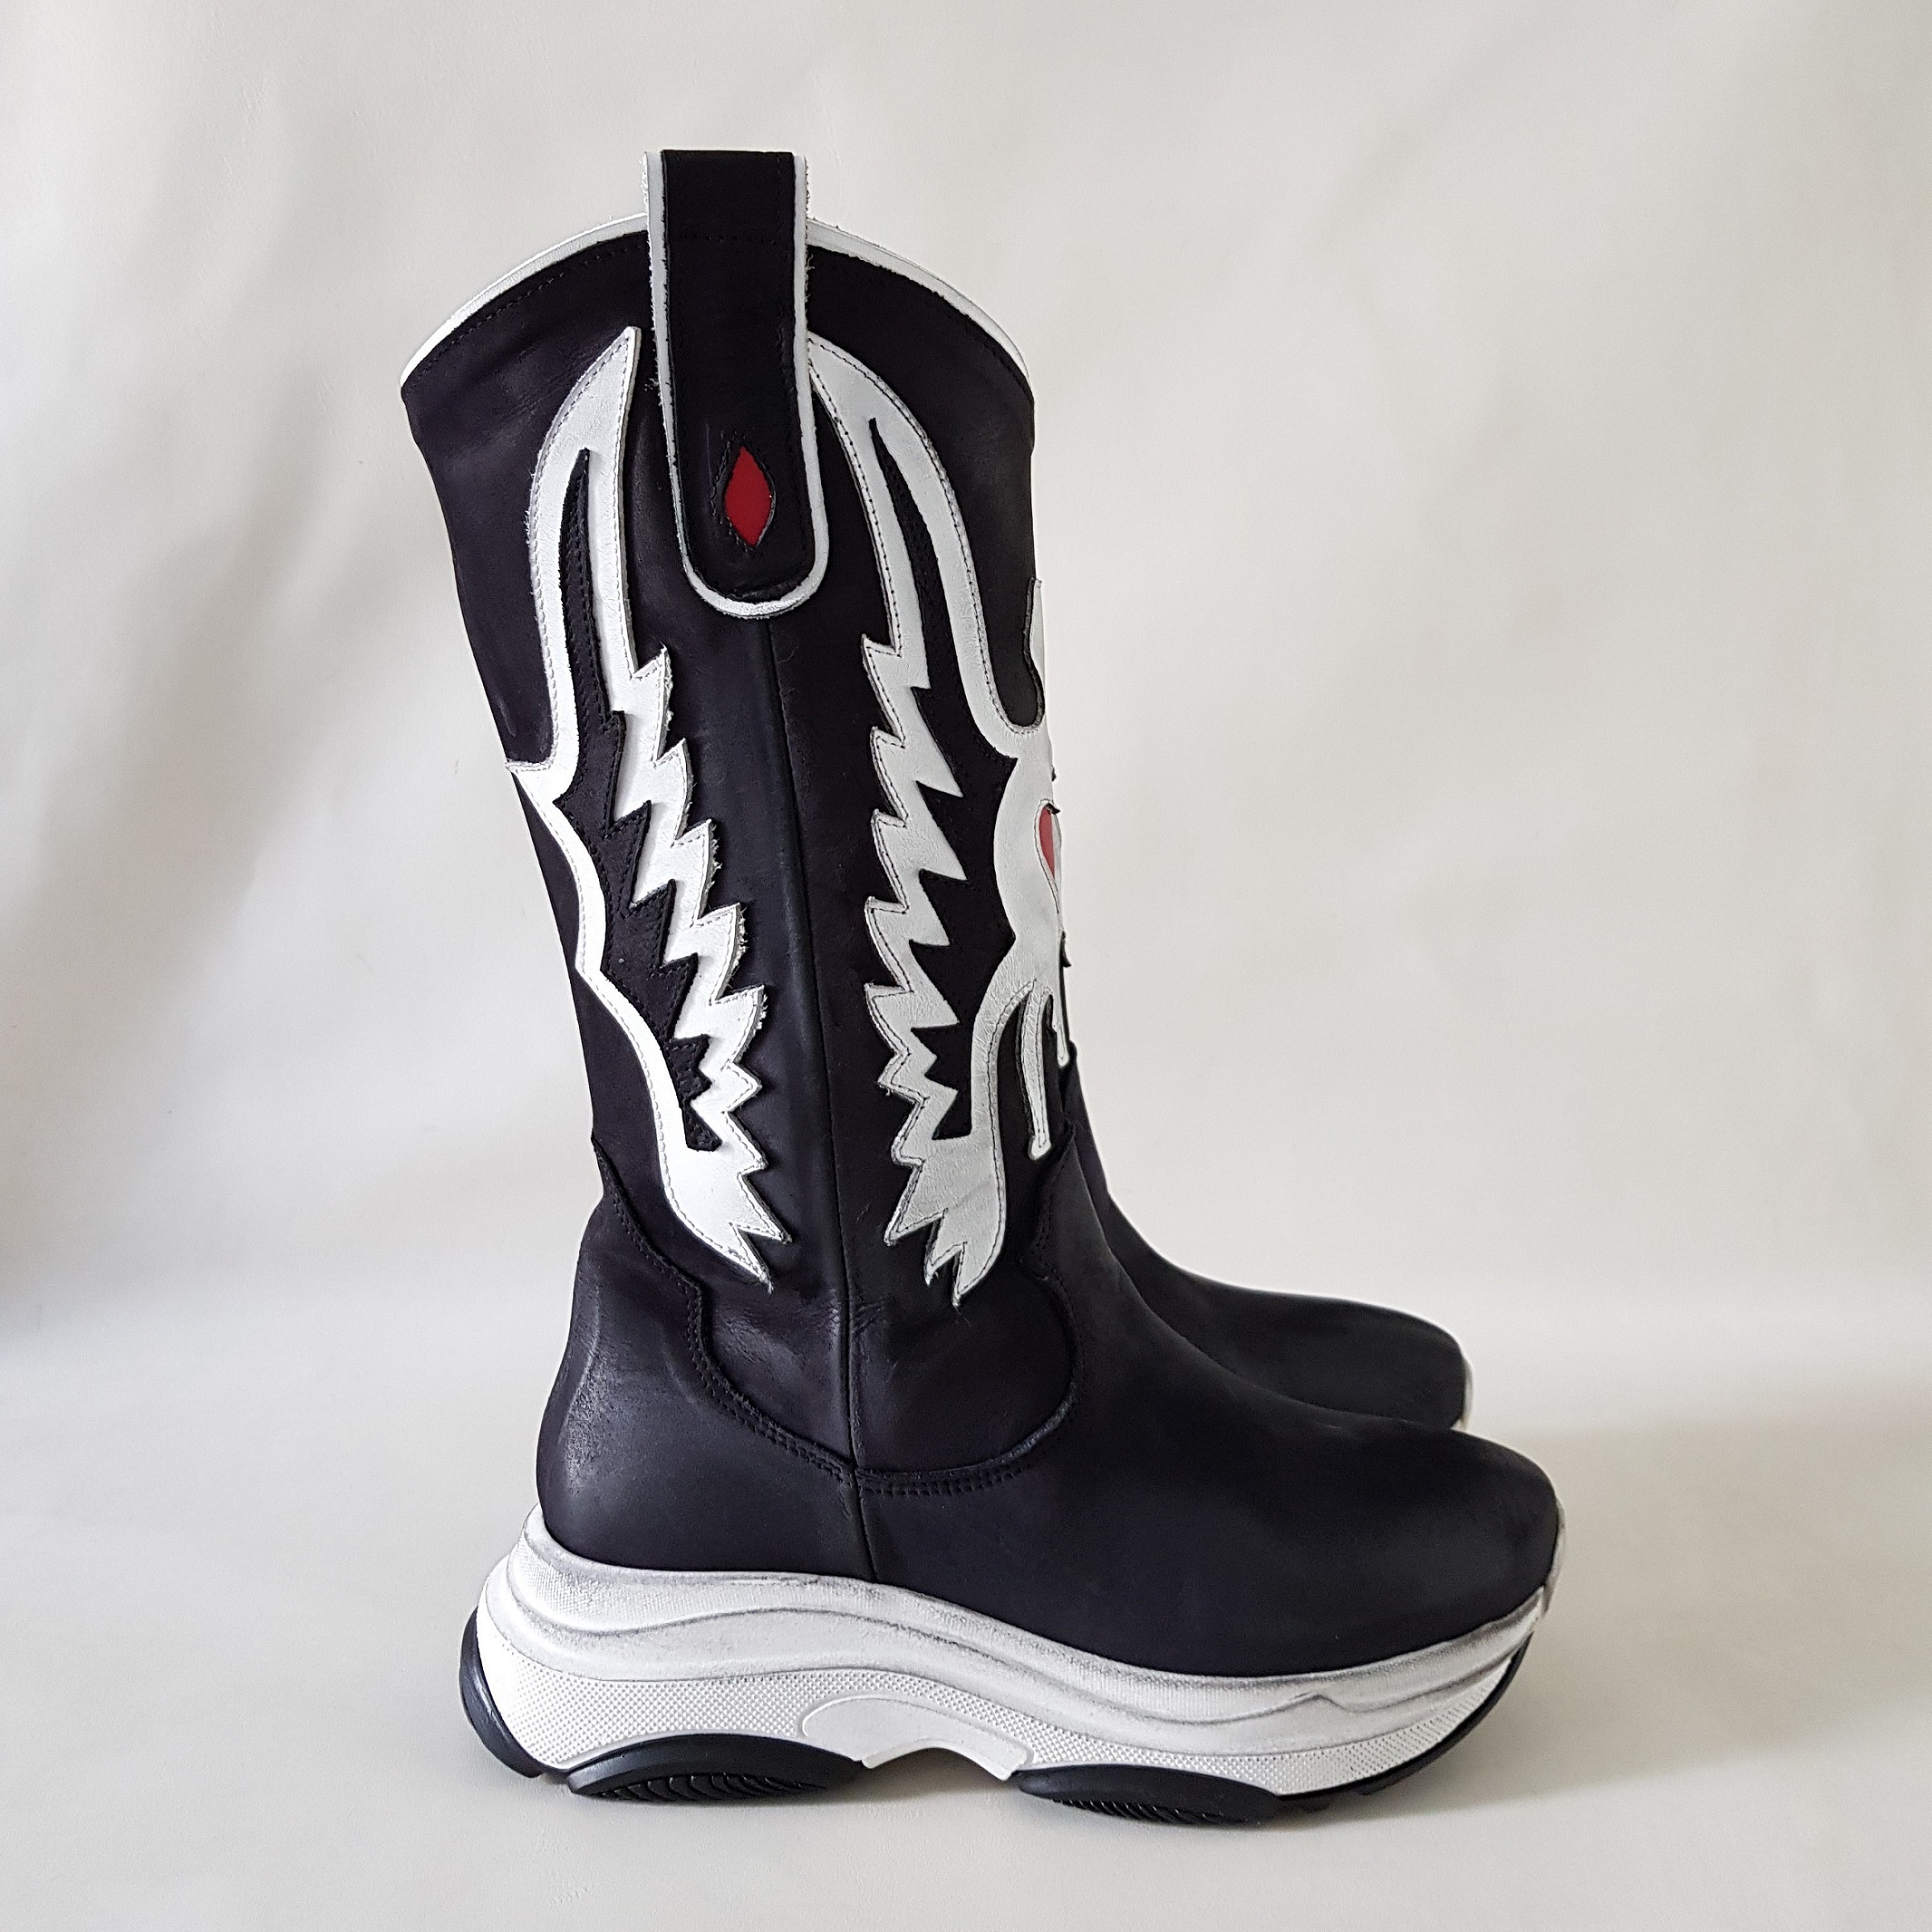 Sneakers stivale nero bianco kent top - Lia diva calzature ...